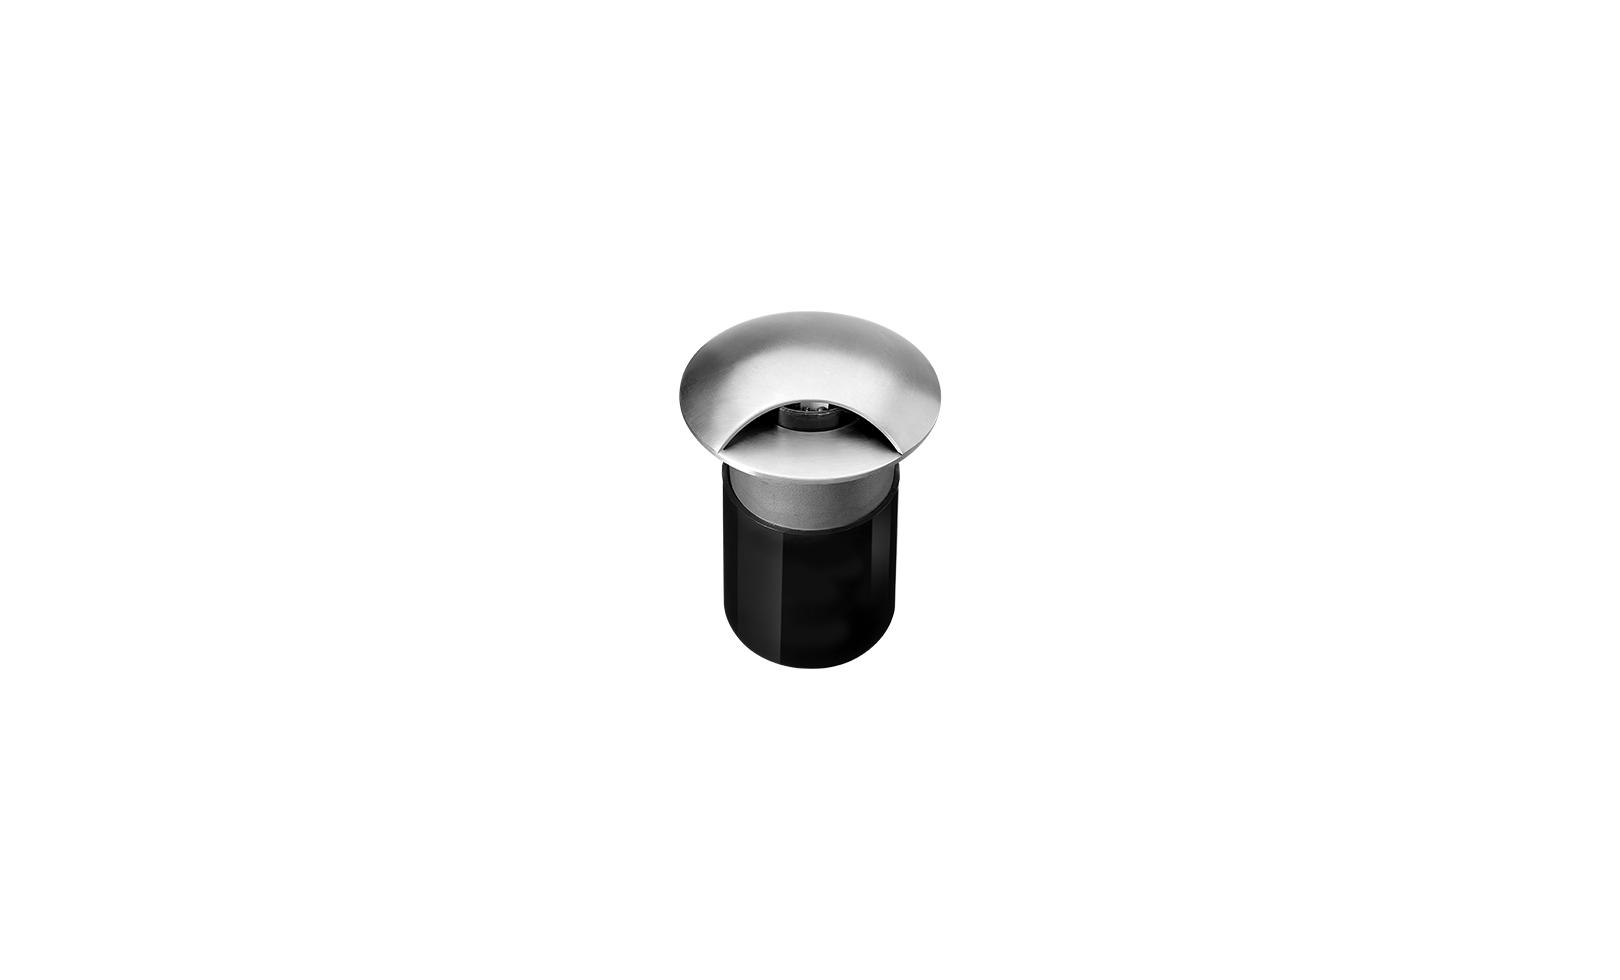 201065 HYDROFLOOR MICRO STEEL 01 LED 3W 2